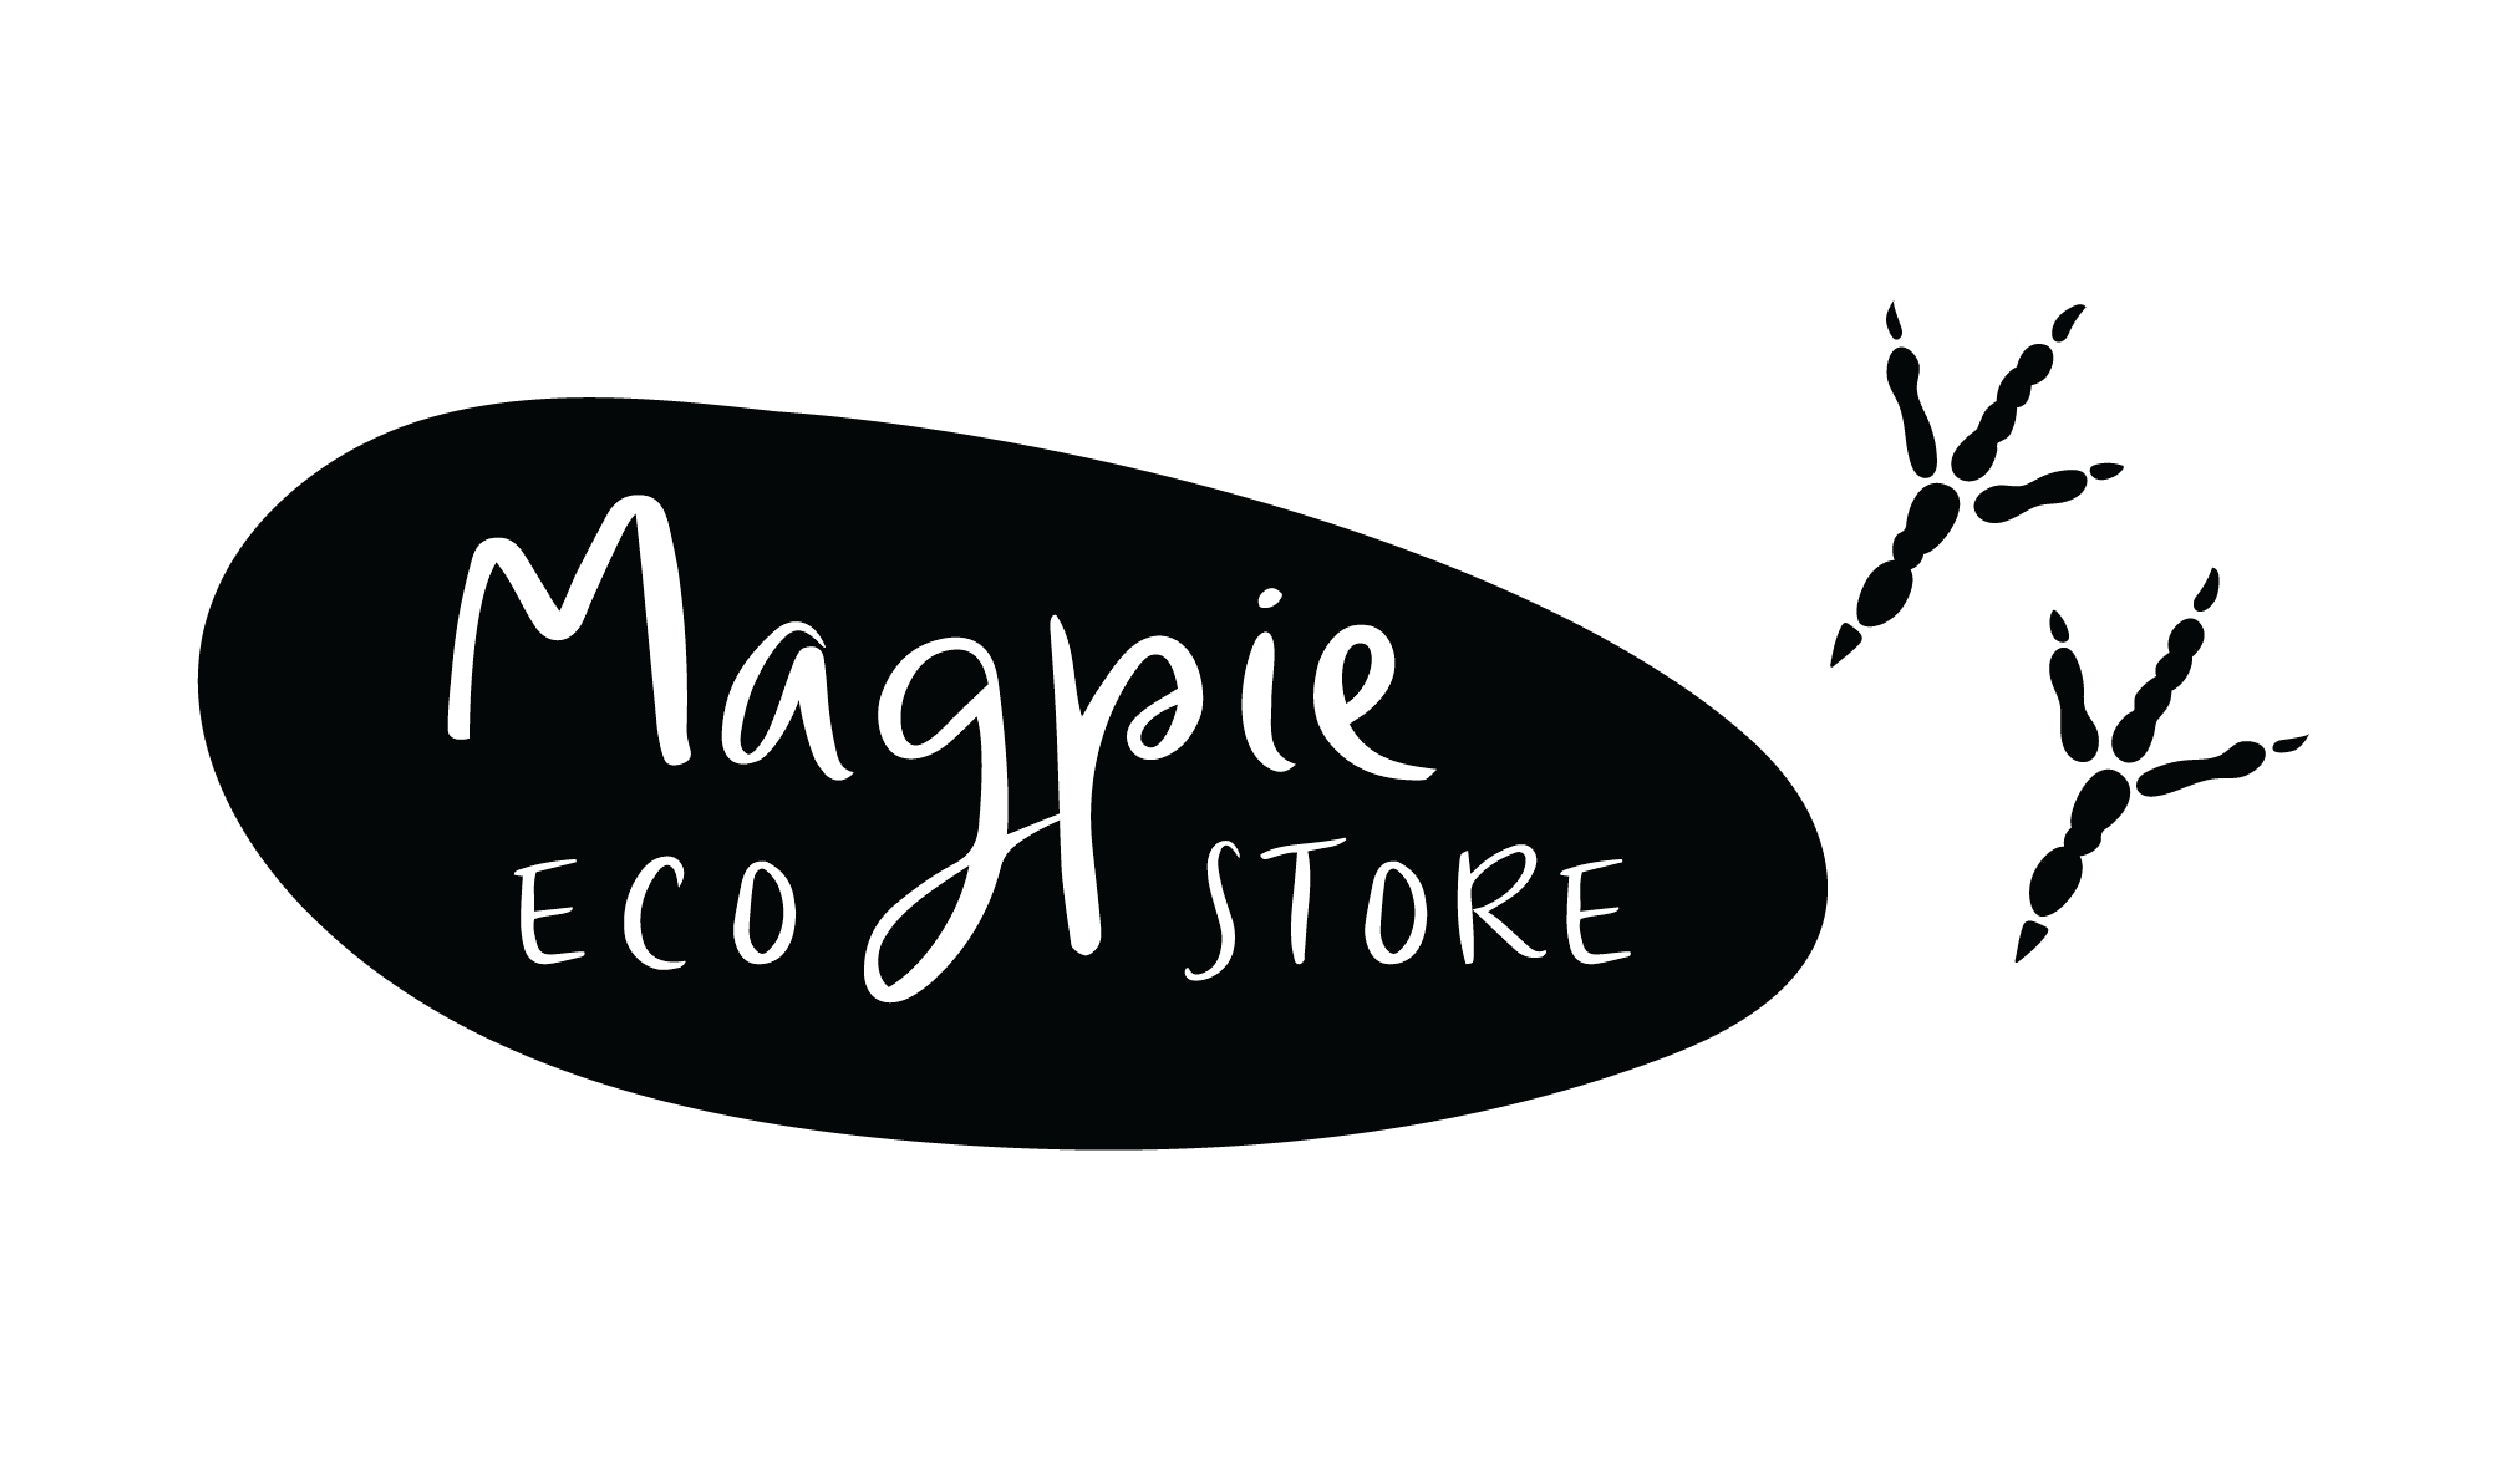 Magpie Ecostore logo